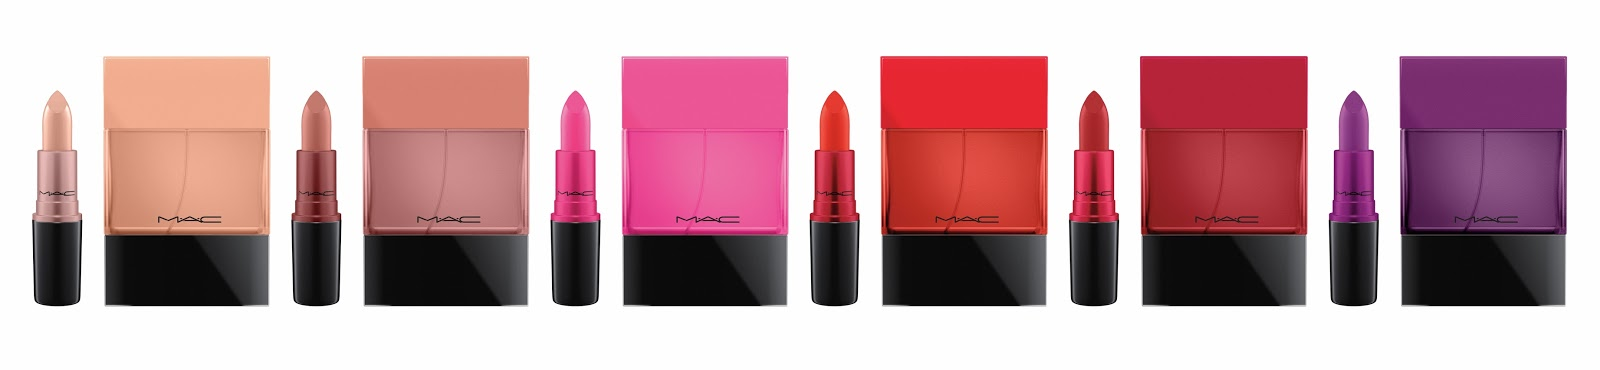 mac shadescents perfume fragrance